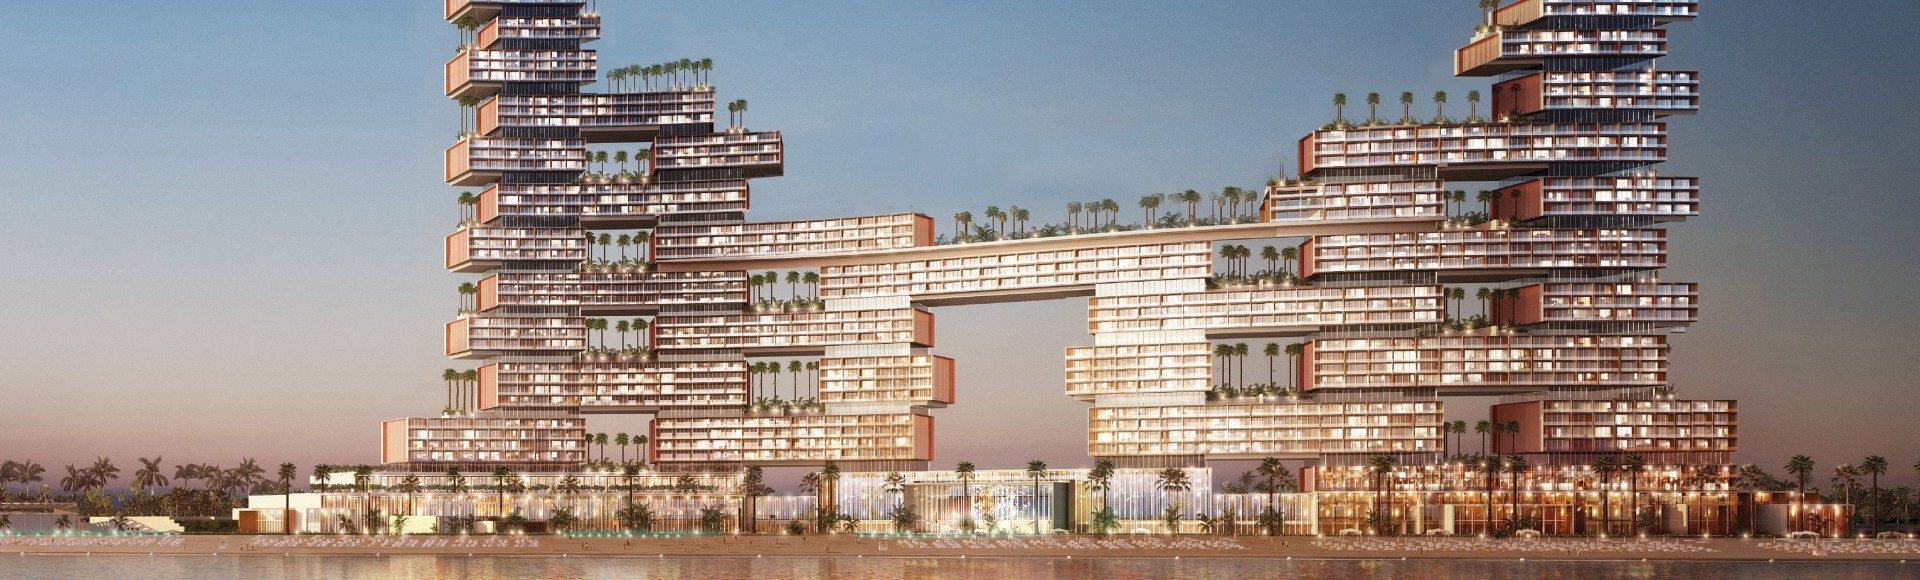 The-Royal-Atlantis-Resort-and-Residences-1920×580-c-center